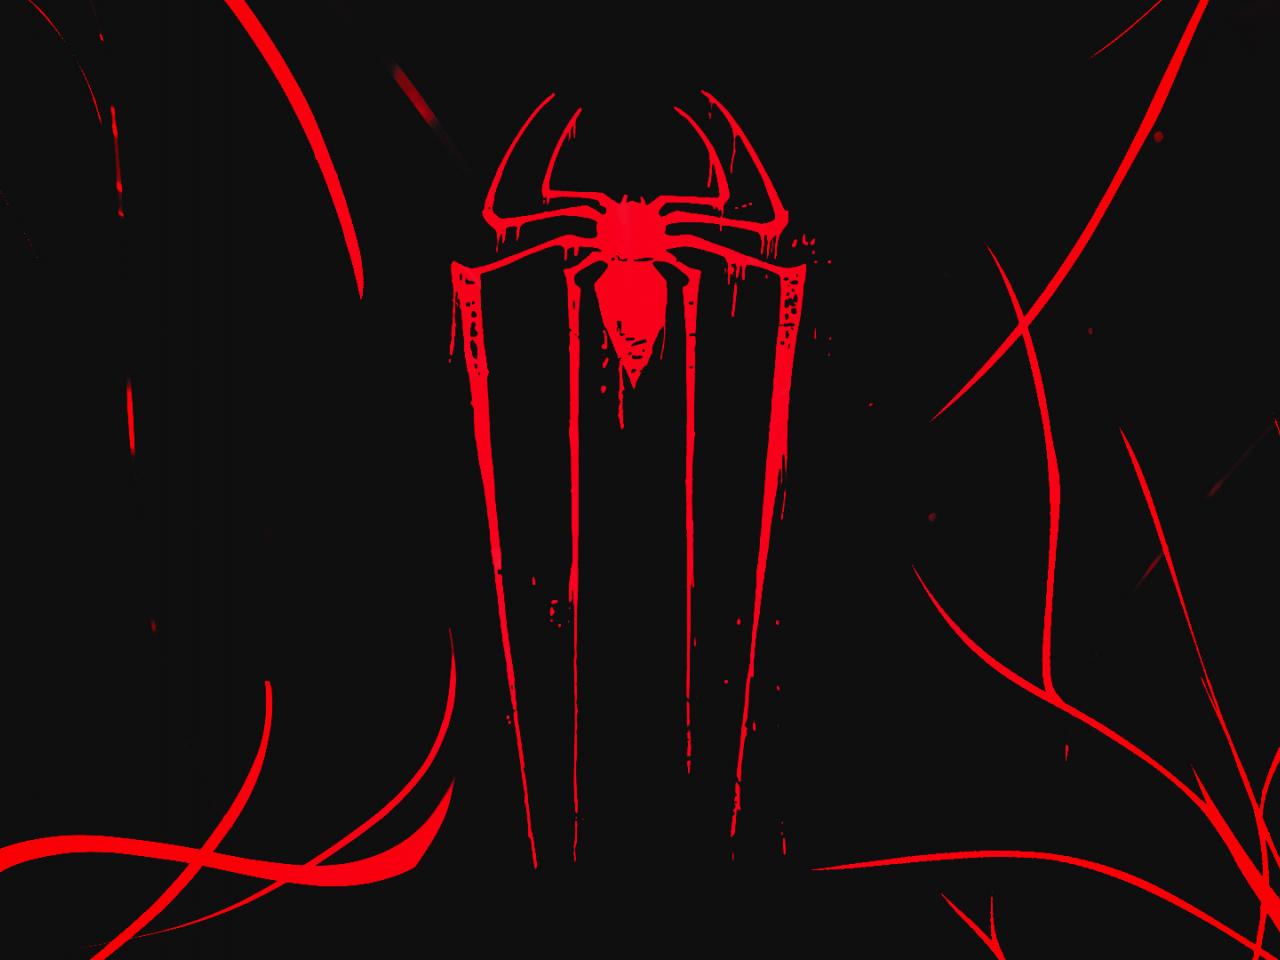 Logo, minimal, spider-man, dark, 1280x960 wallpaper